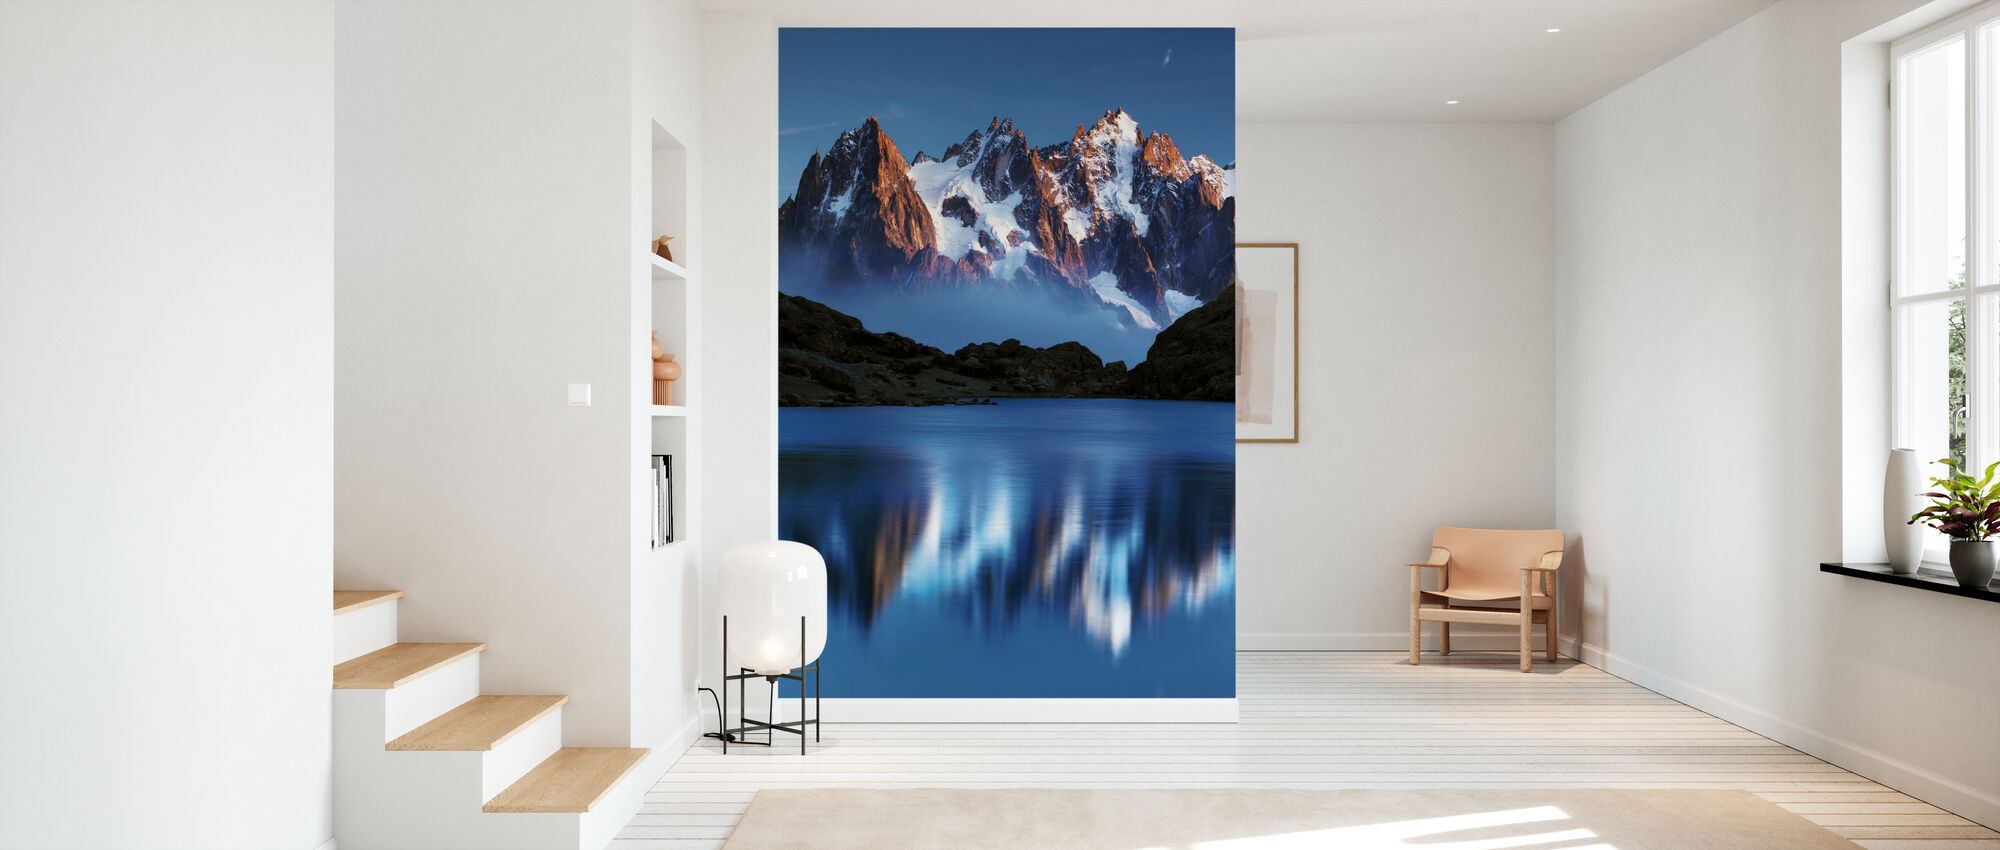 Blue Mountain Mirror - Wallpaper - Hallway